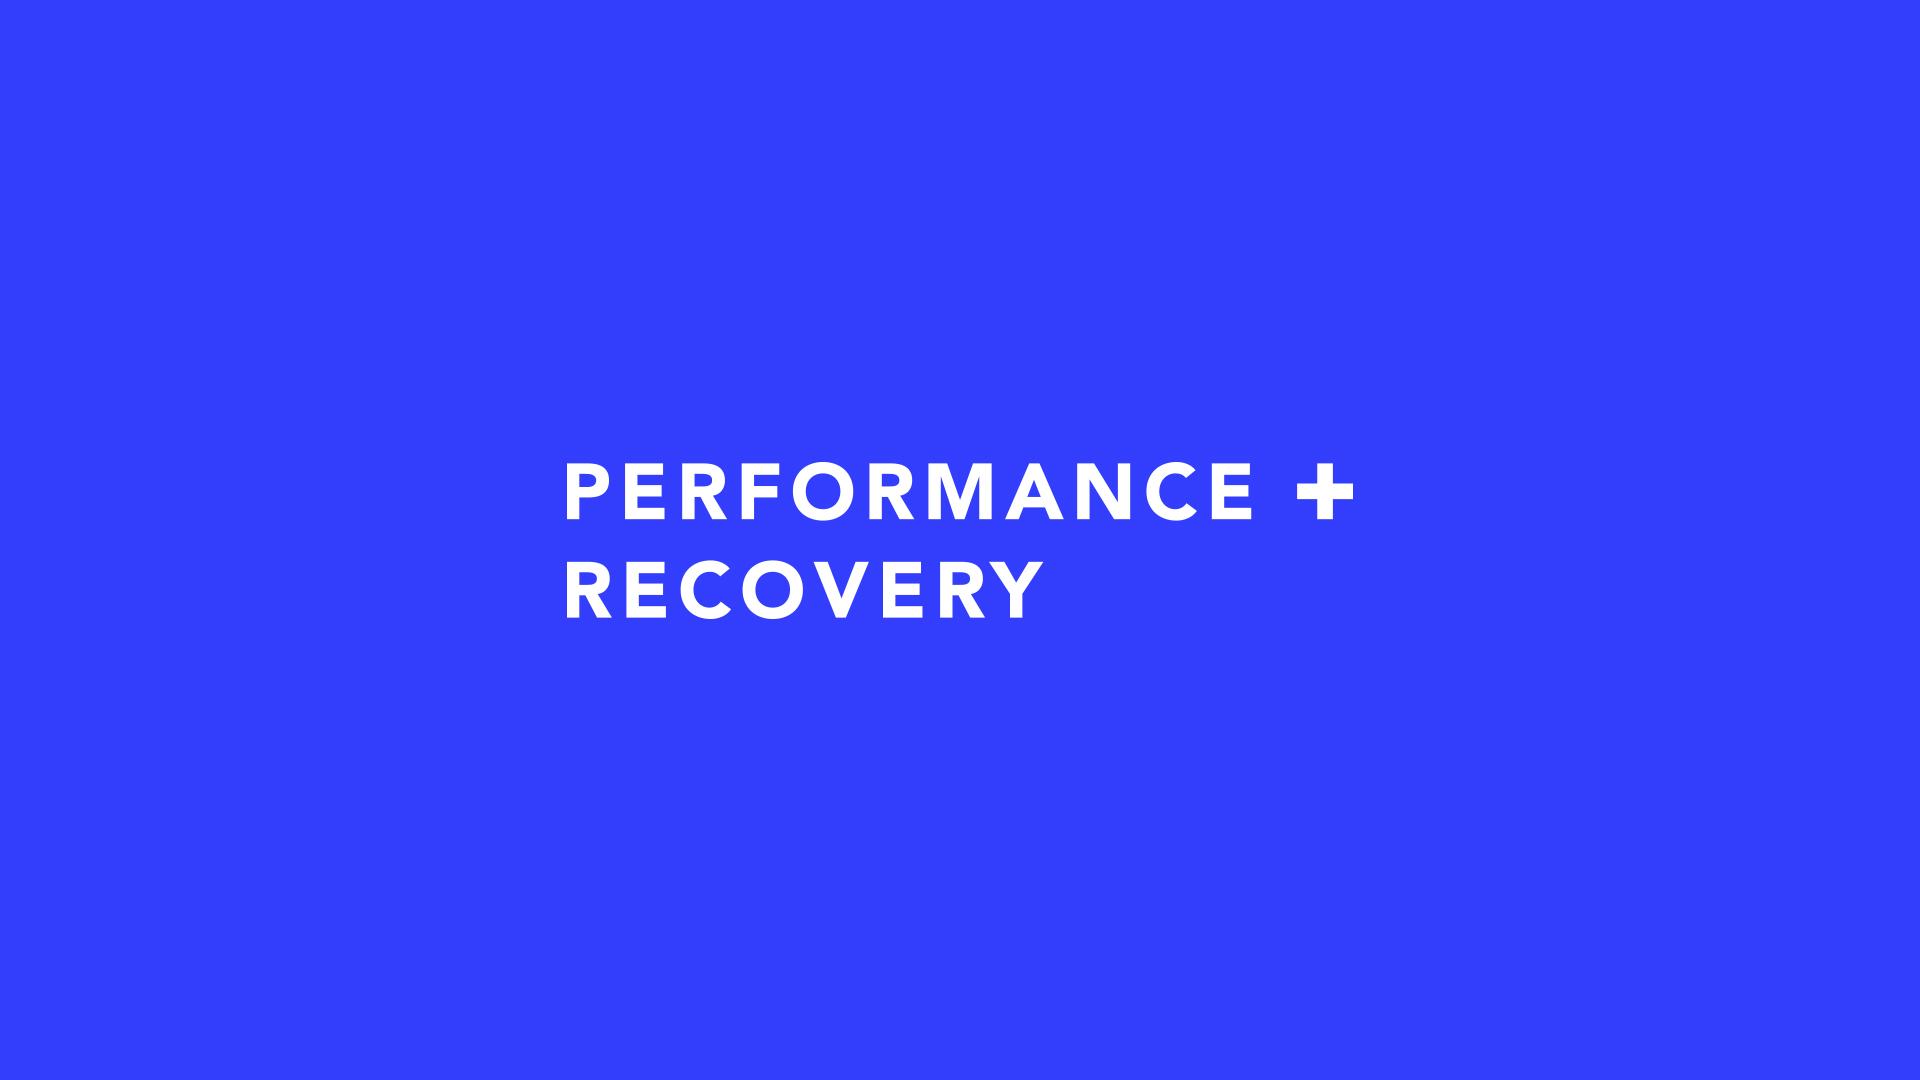 02-Lobo-Creative Performance+Recovery Bournemouth-brand-design-website-design-case-study.jpg